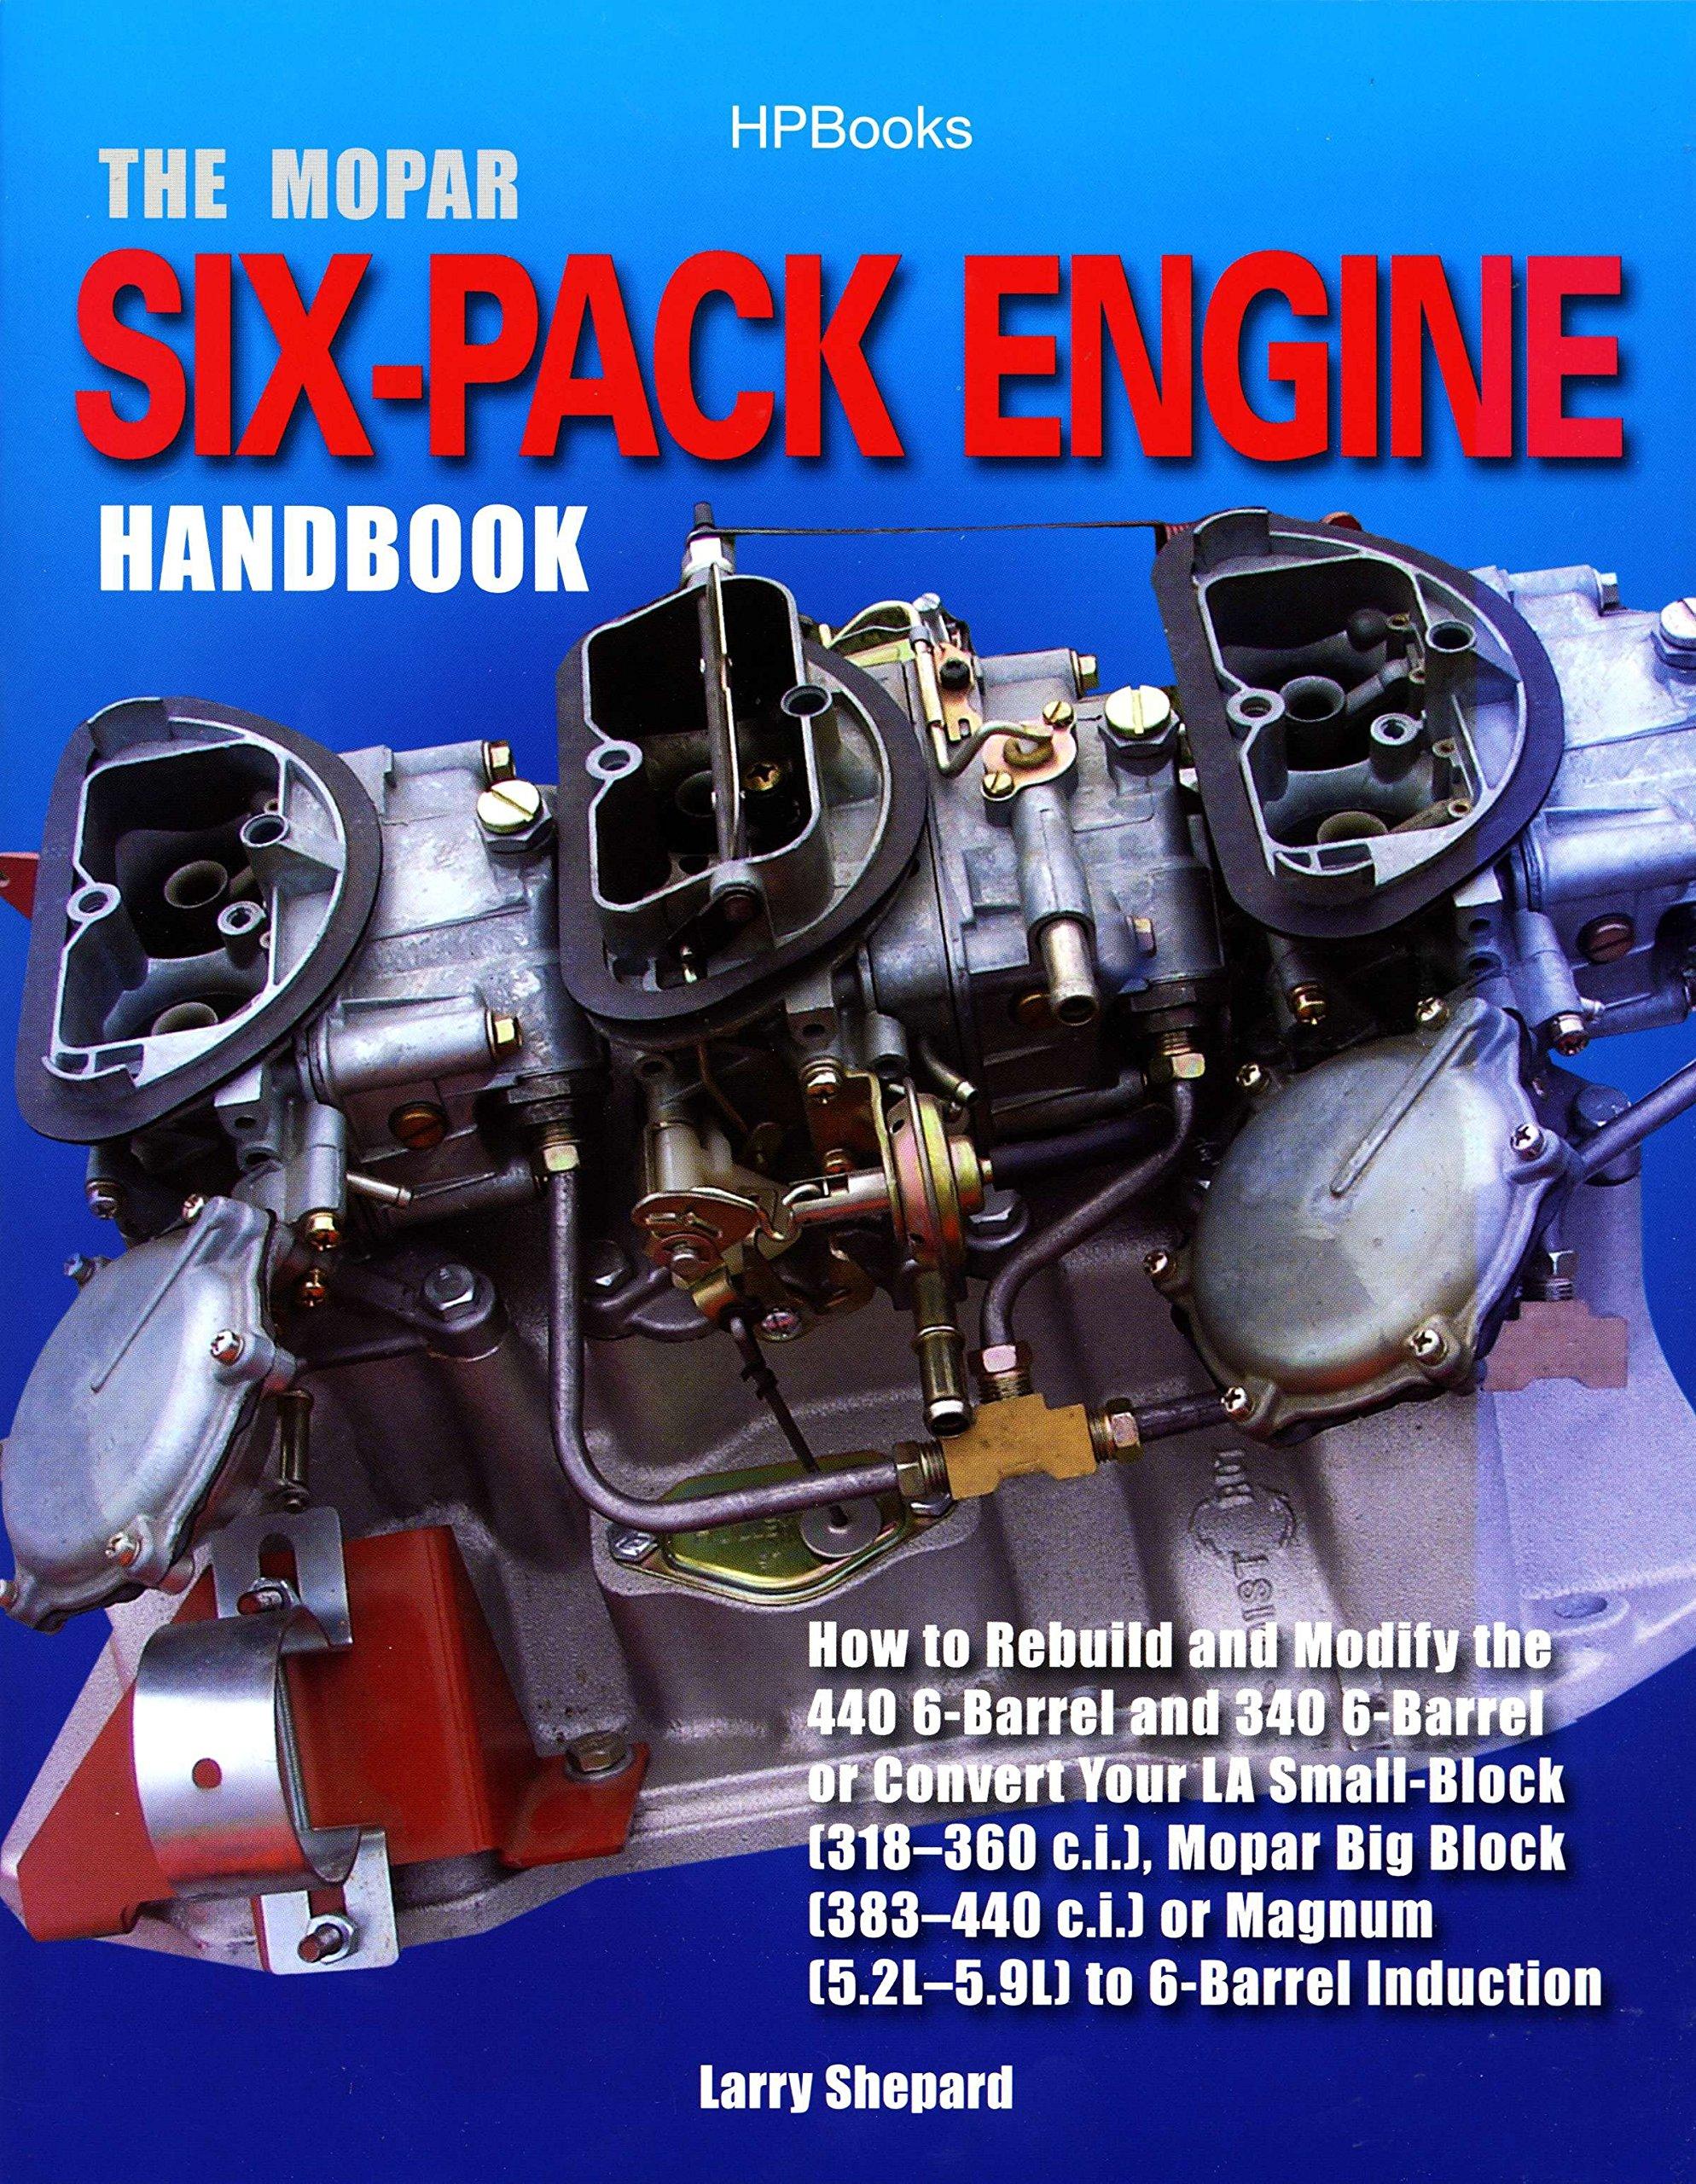 The Mopar Six-Pack Engine Handbook HP1528: How to Rebuild